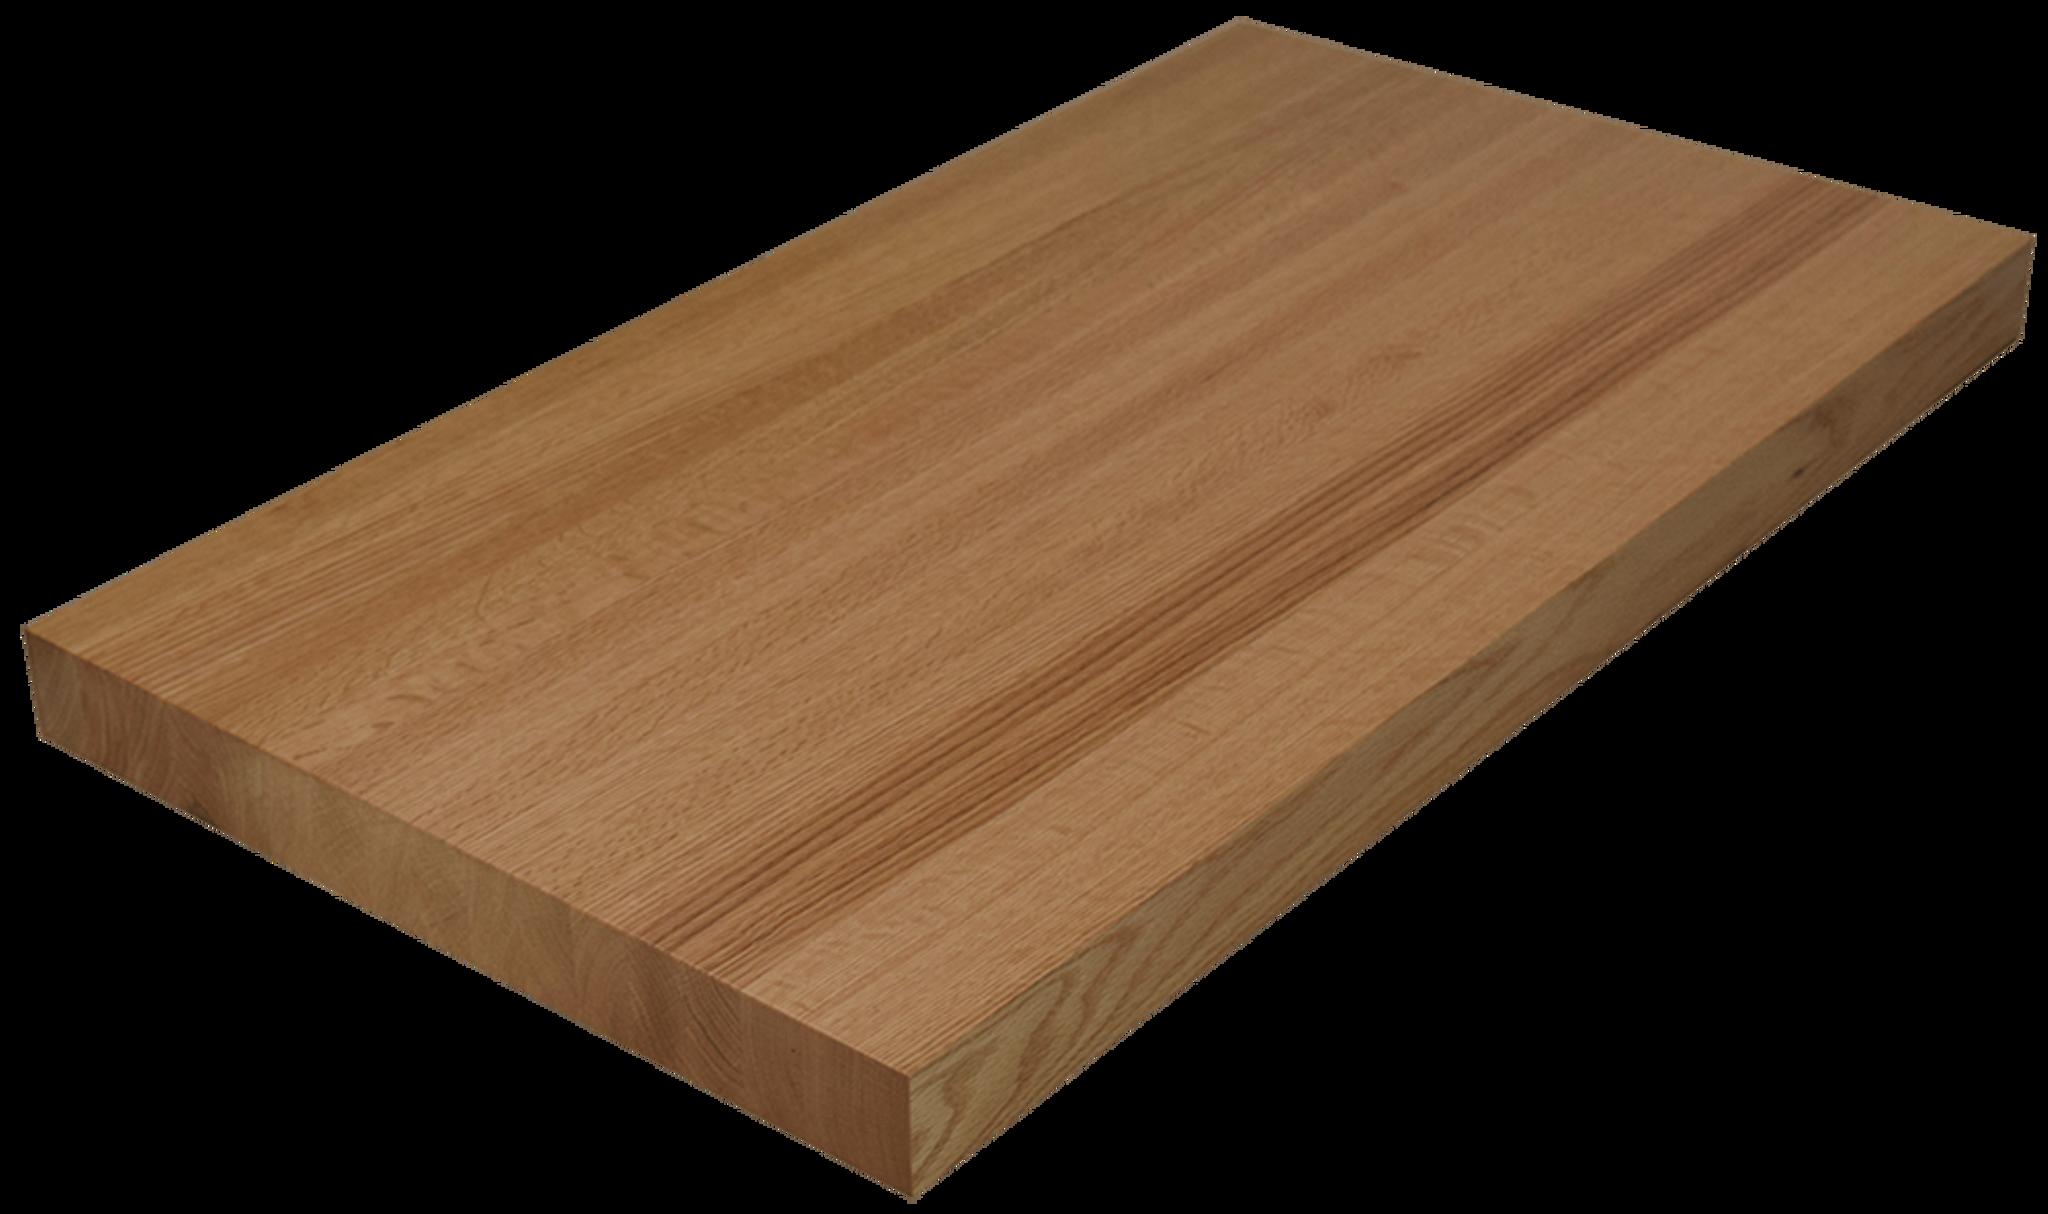 Perfect Red Oak Edge Grain Butcher Block Countertop